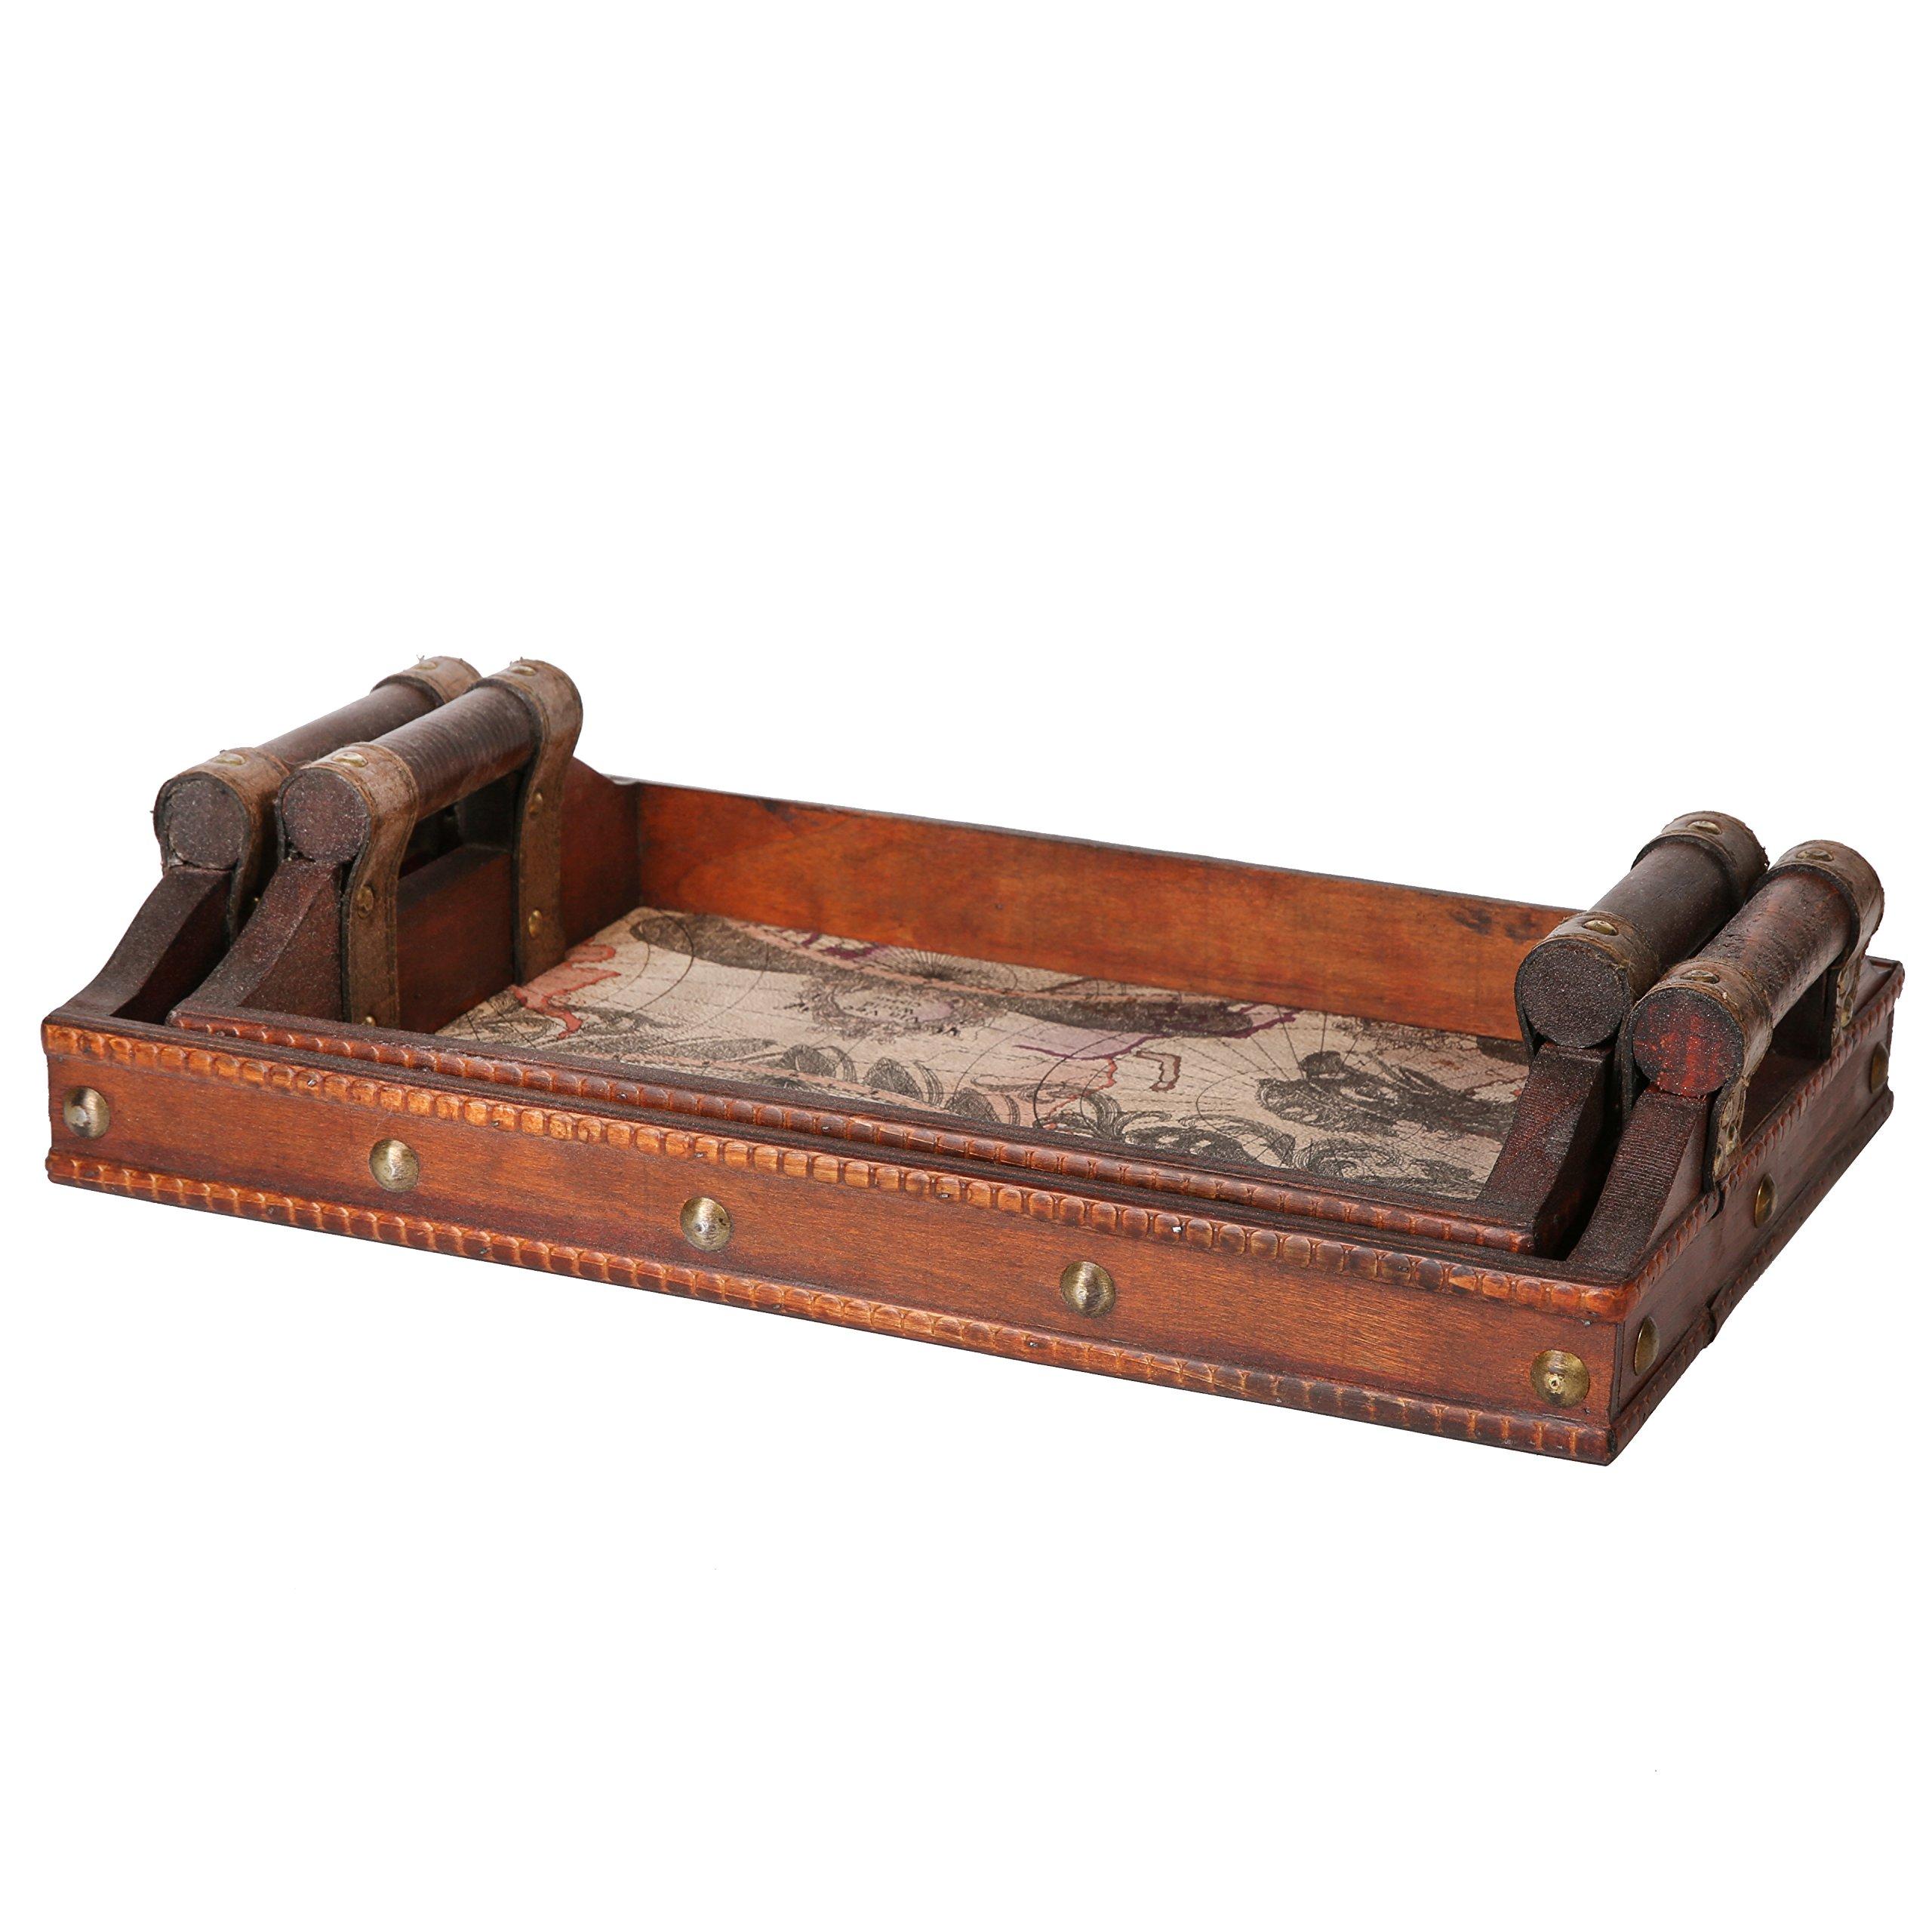 SLPR Worldly Wooden Designer Serving Tray Set with Handles (Set of 2) | Wood Nesting Rectangular Travel Themed Butler Breakfast Vintage Style Serving Tray by SLPR (Image #2)